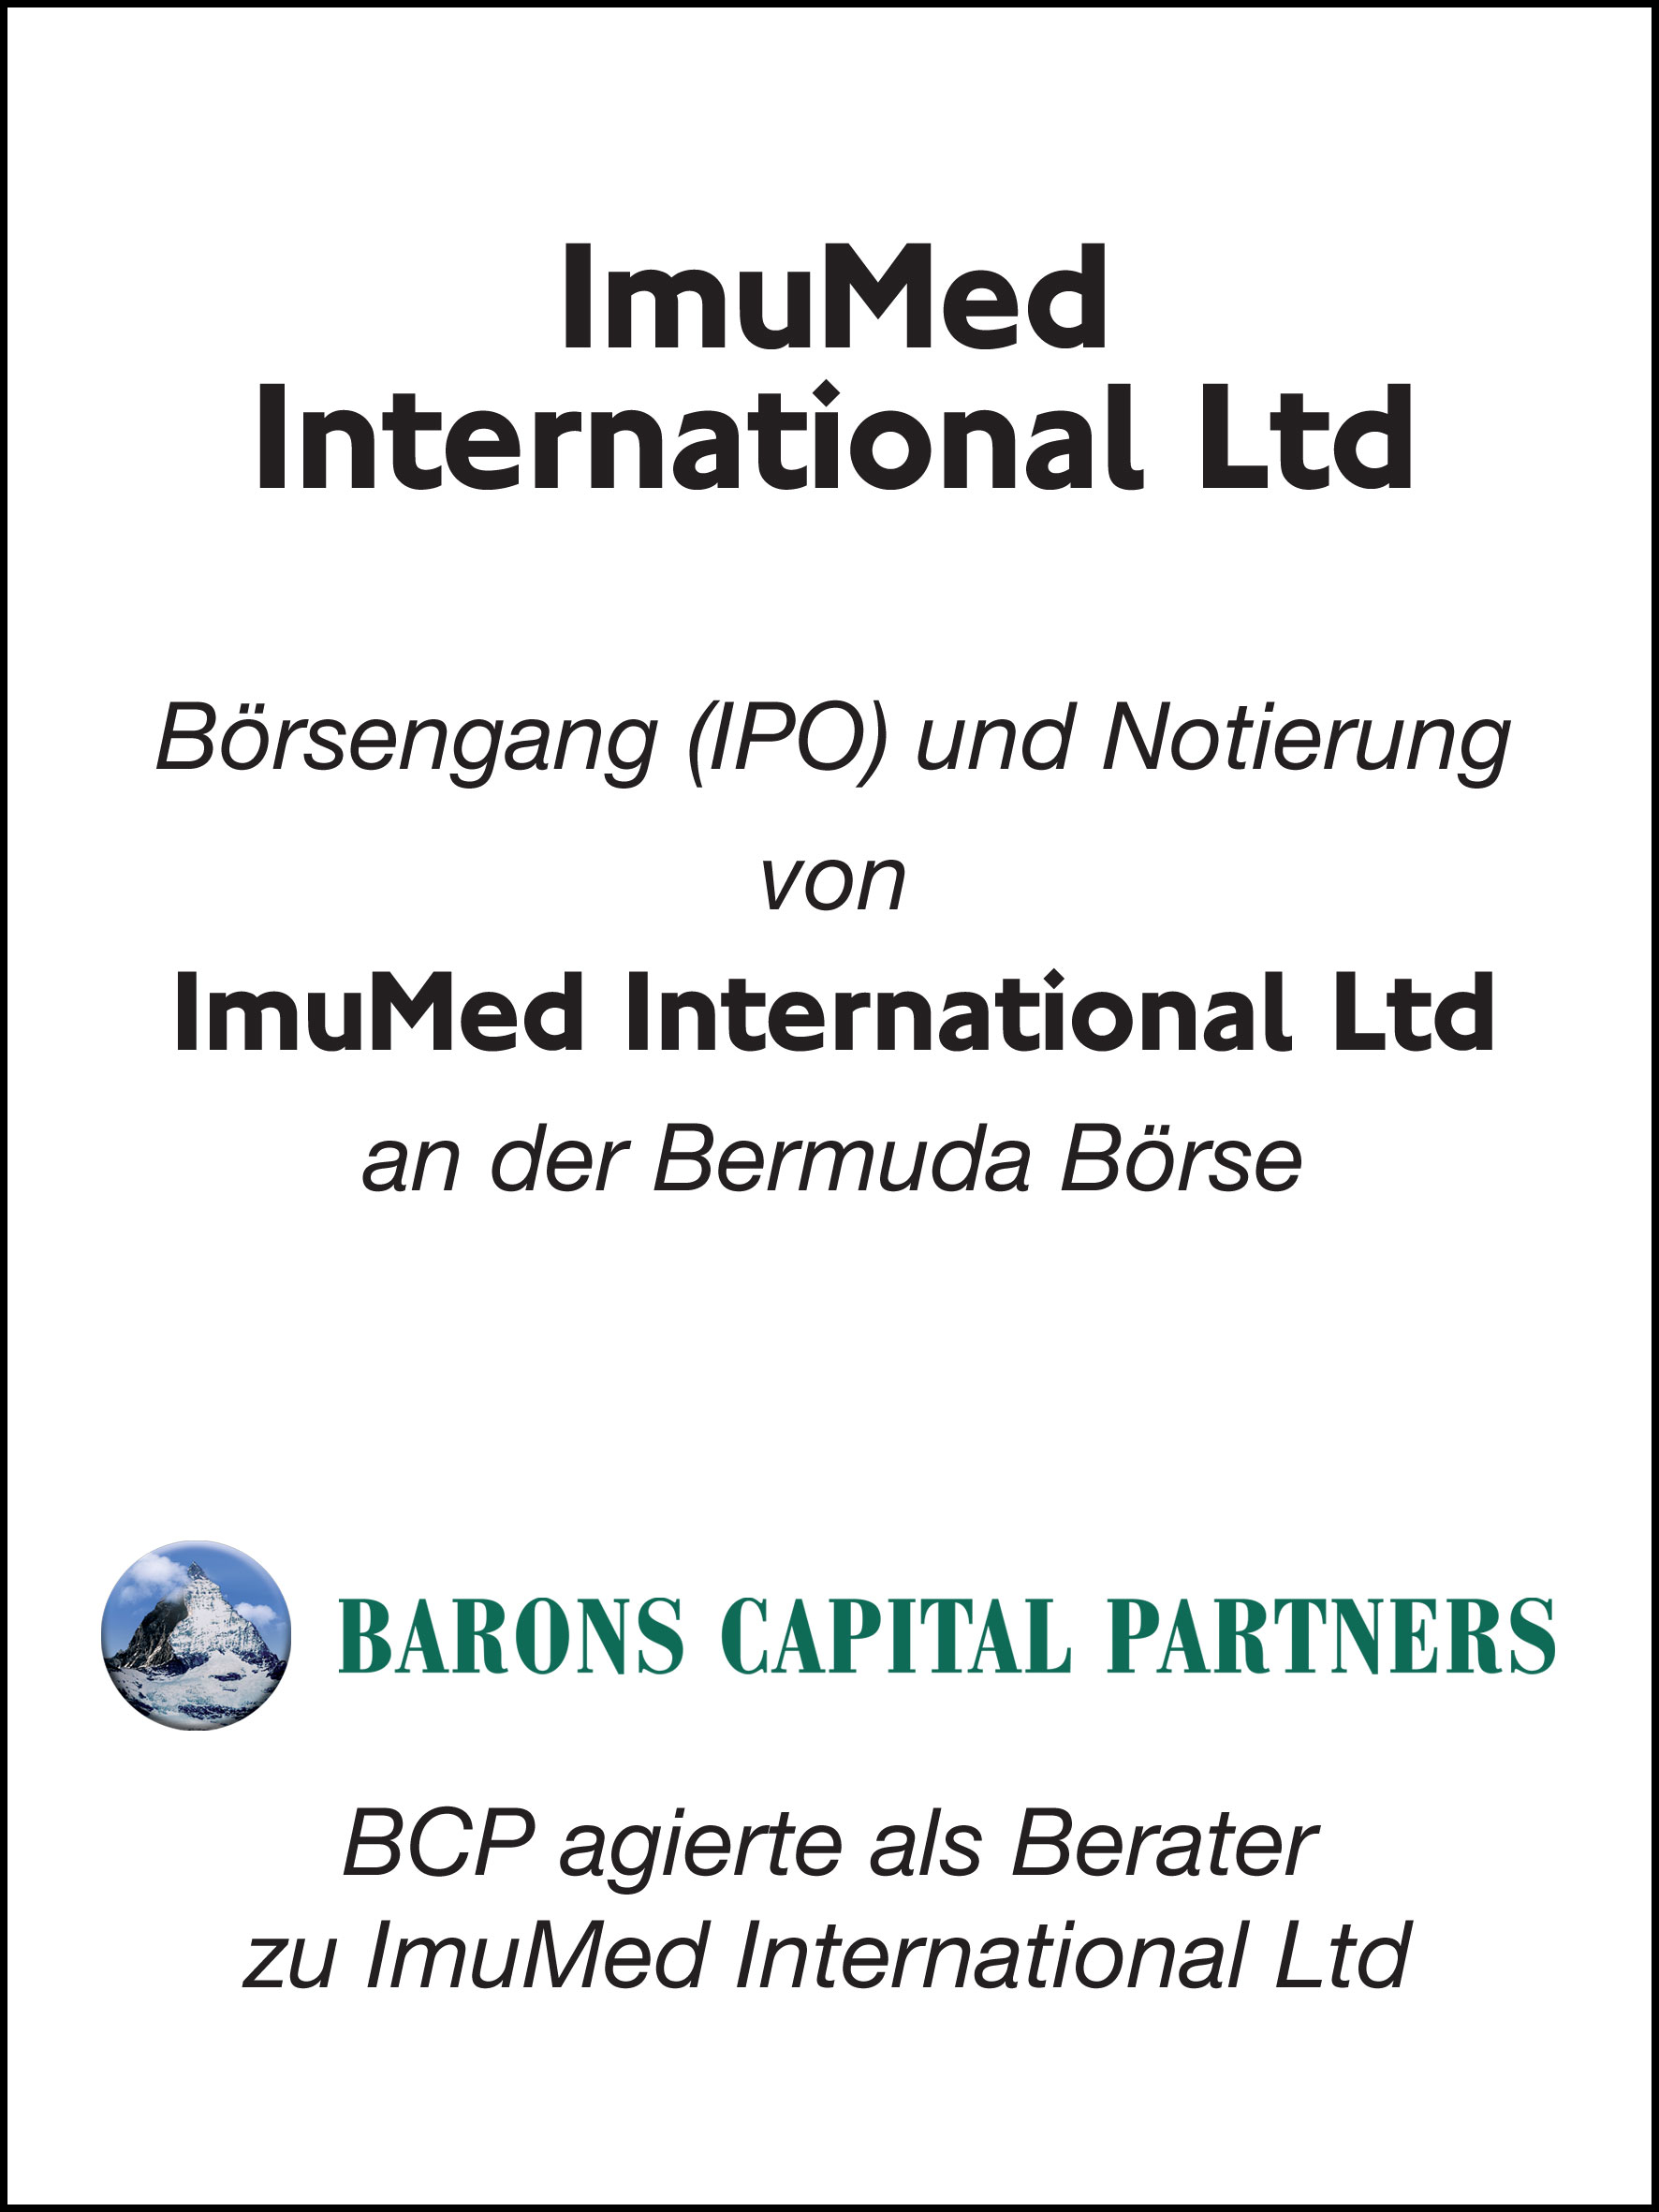 41_ImuMed International Ltd_G